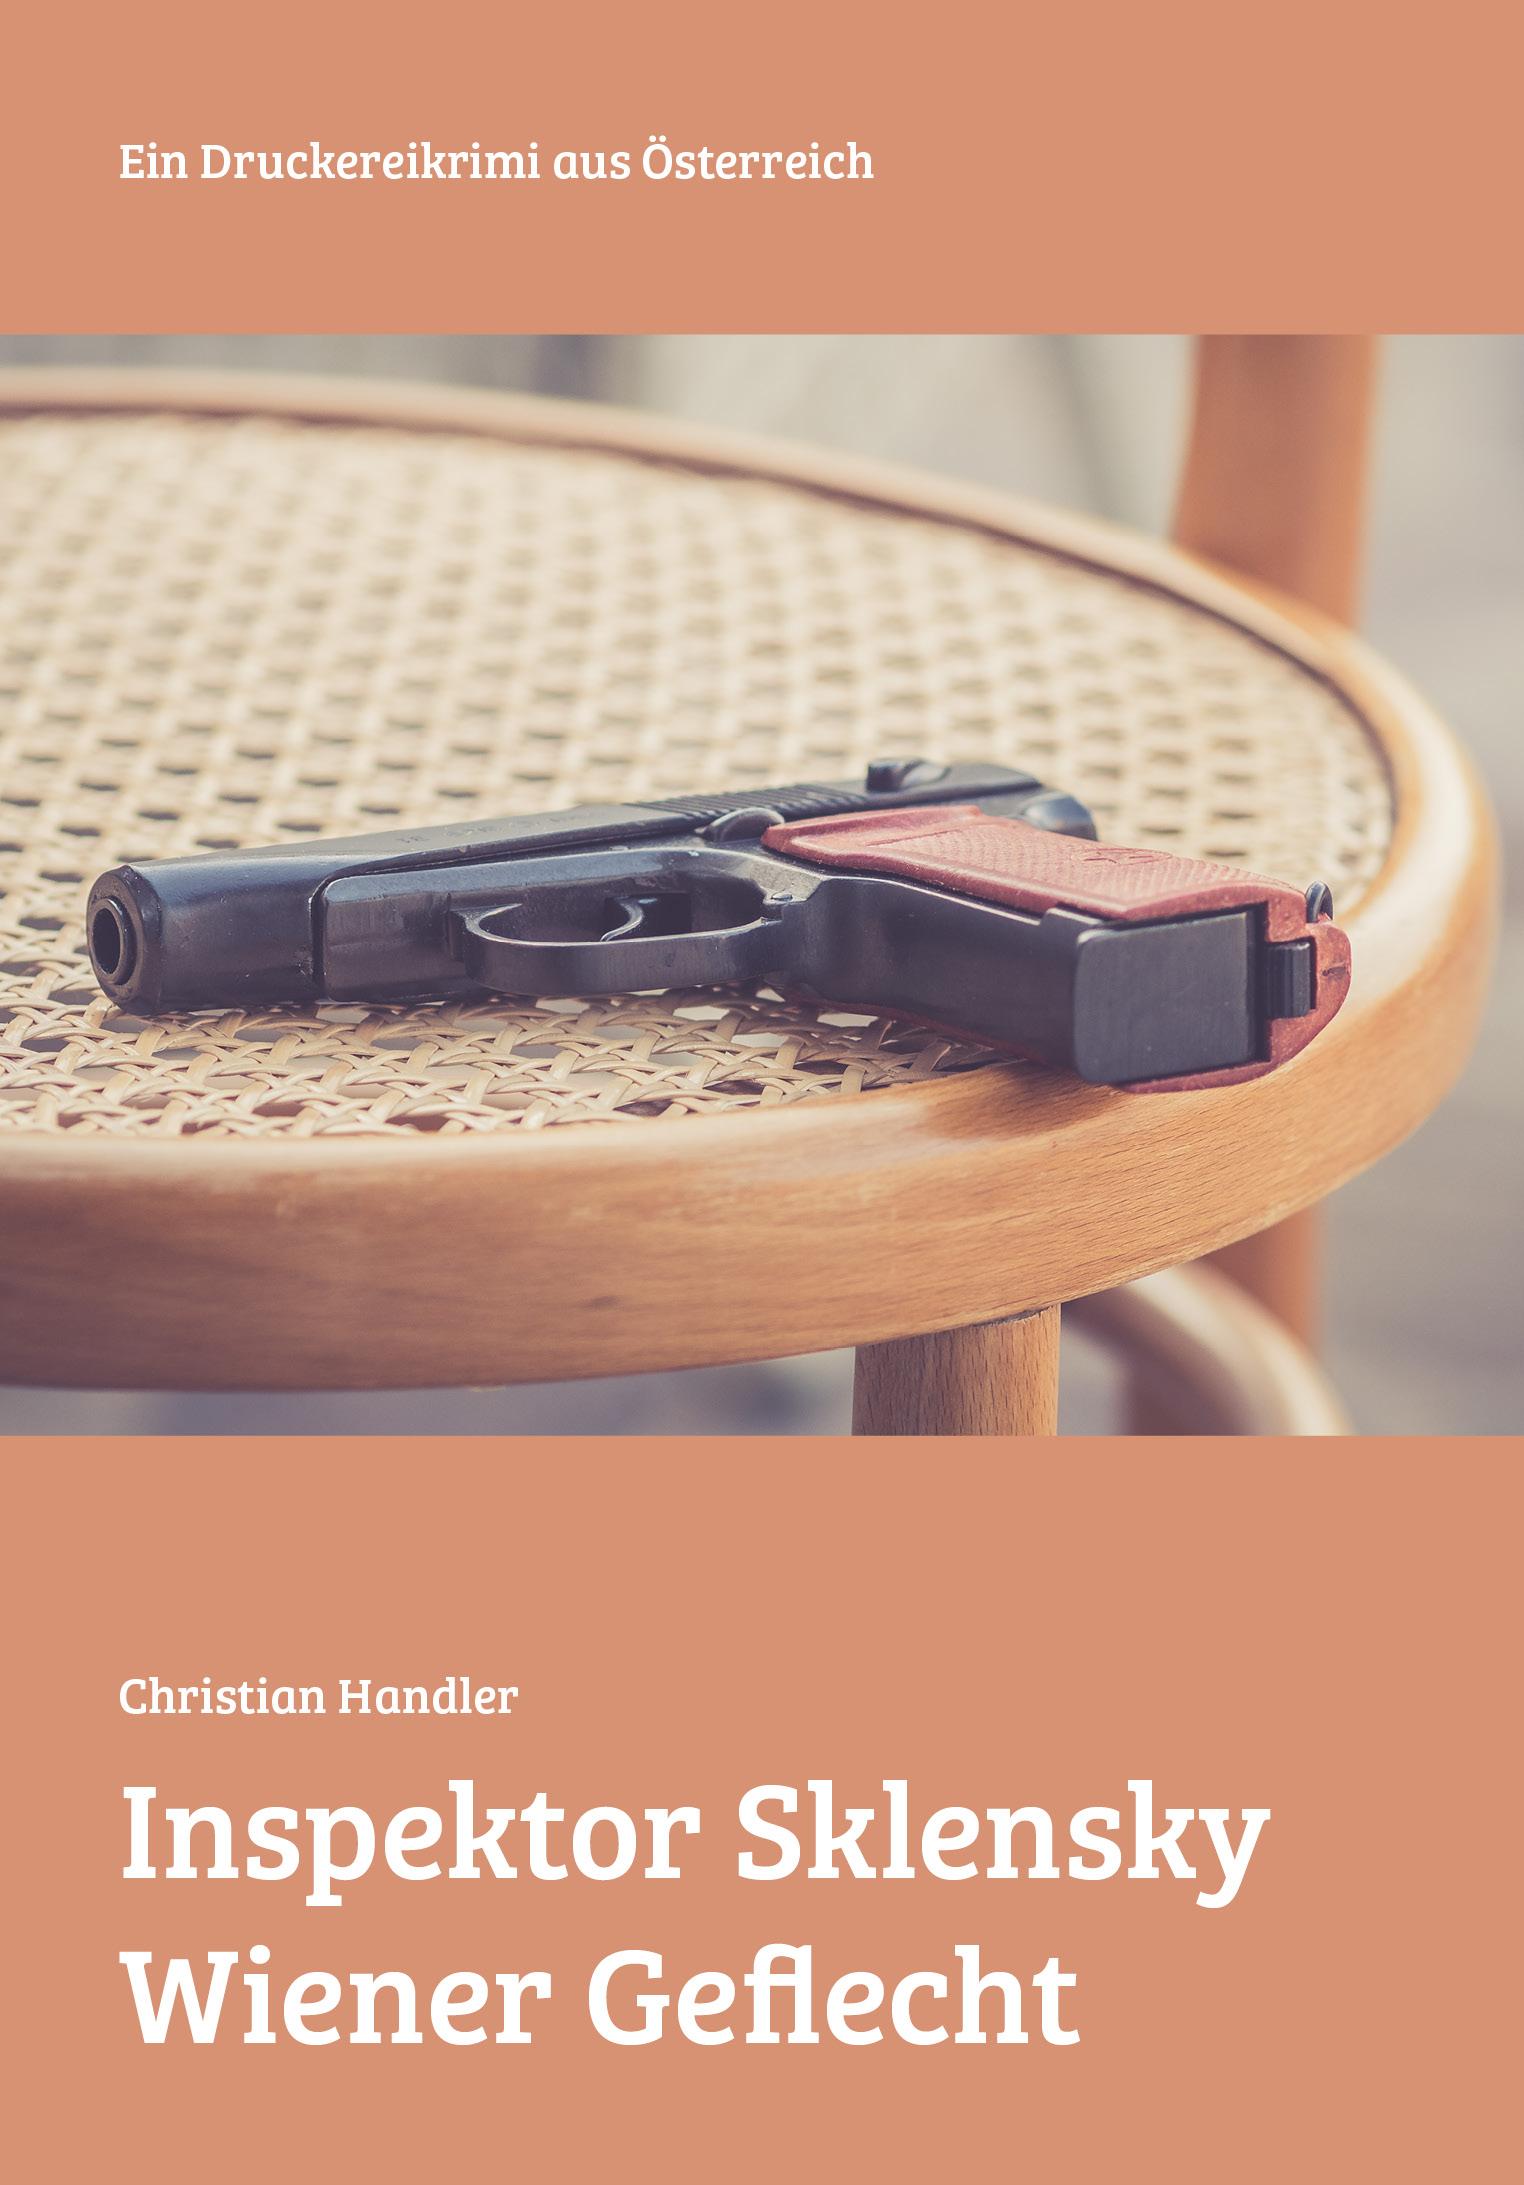 Inspektor Sklensky: Wiener Geflecht, Christian Handler